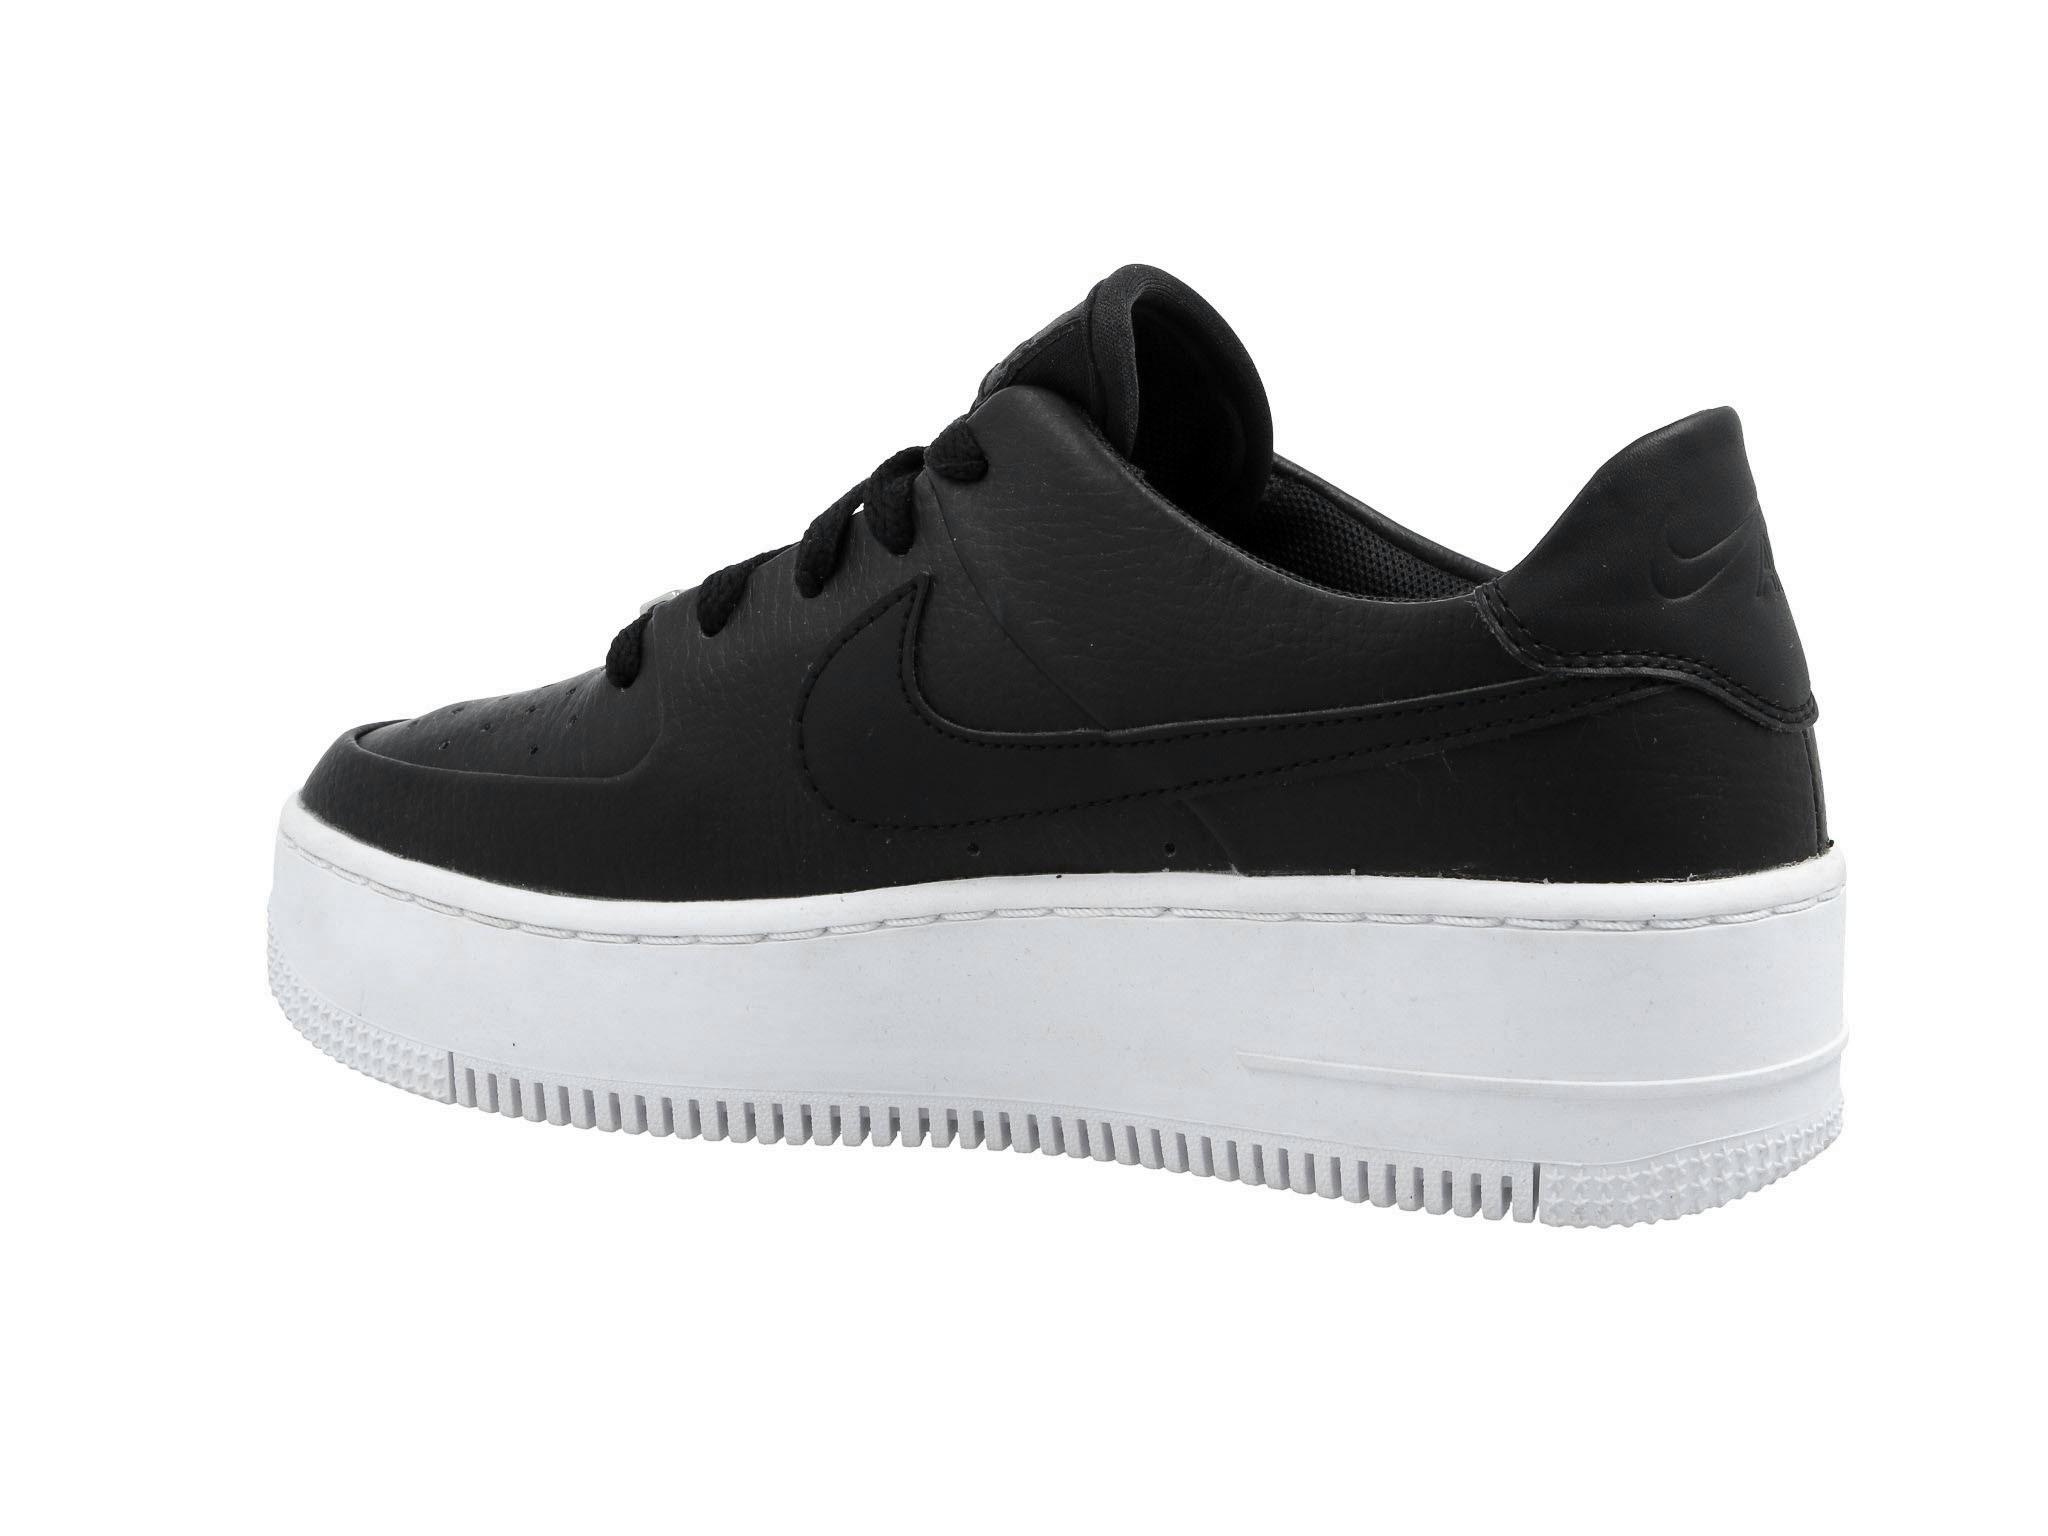 Vásárlás: Nike cipő Nike Air Force 1 Sage Low W AR5339 002